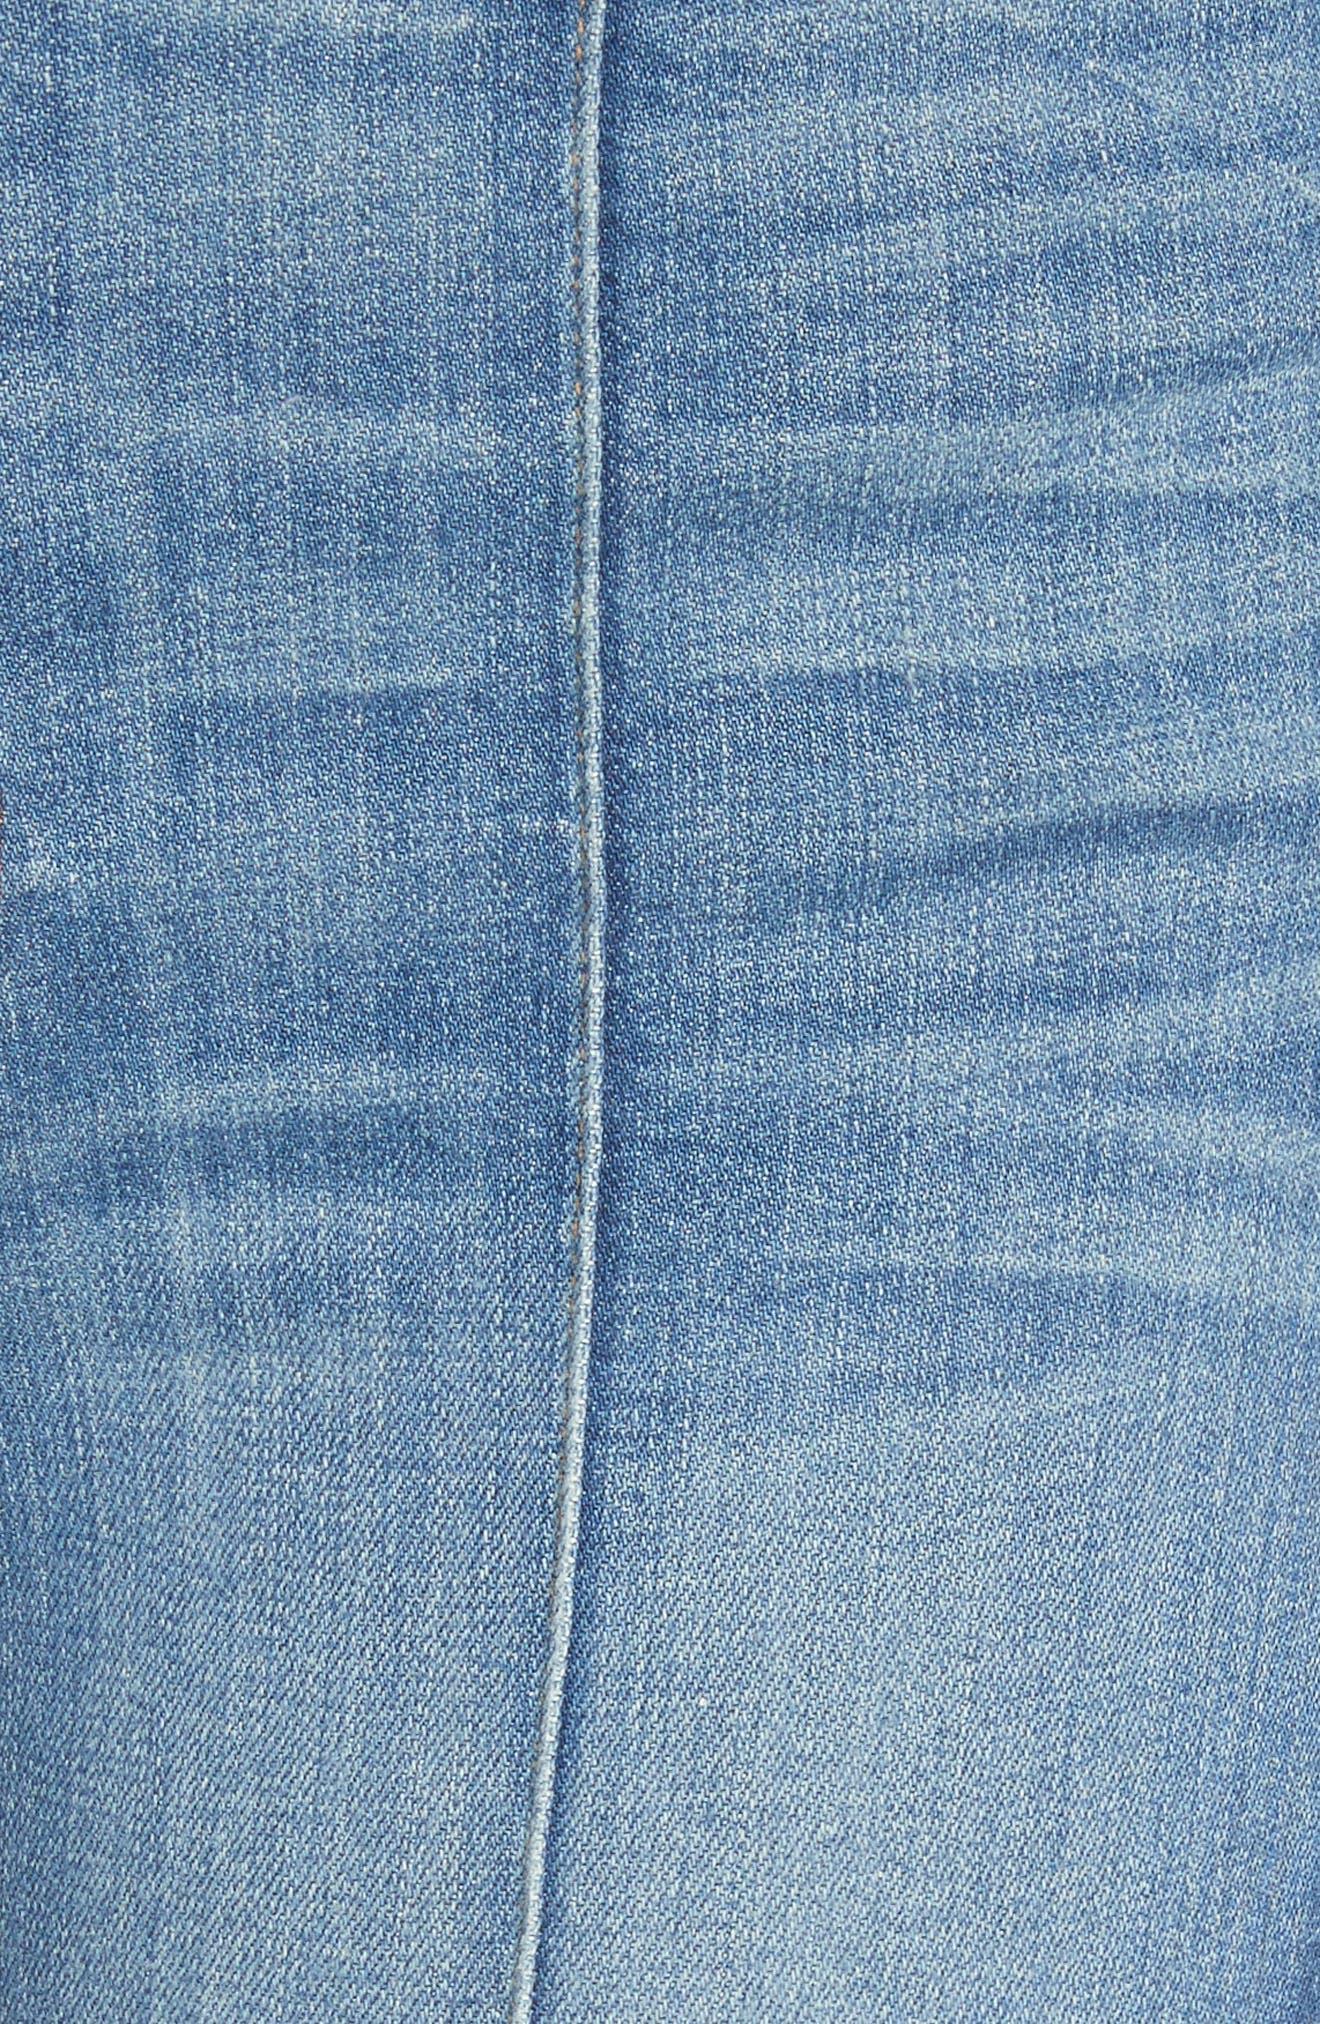 AO.LA Good High Waist Pintuck Skinny Jeans,                             Alternate thumbnail 5, color,                             482